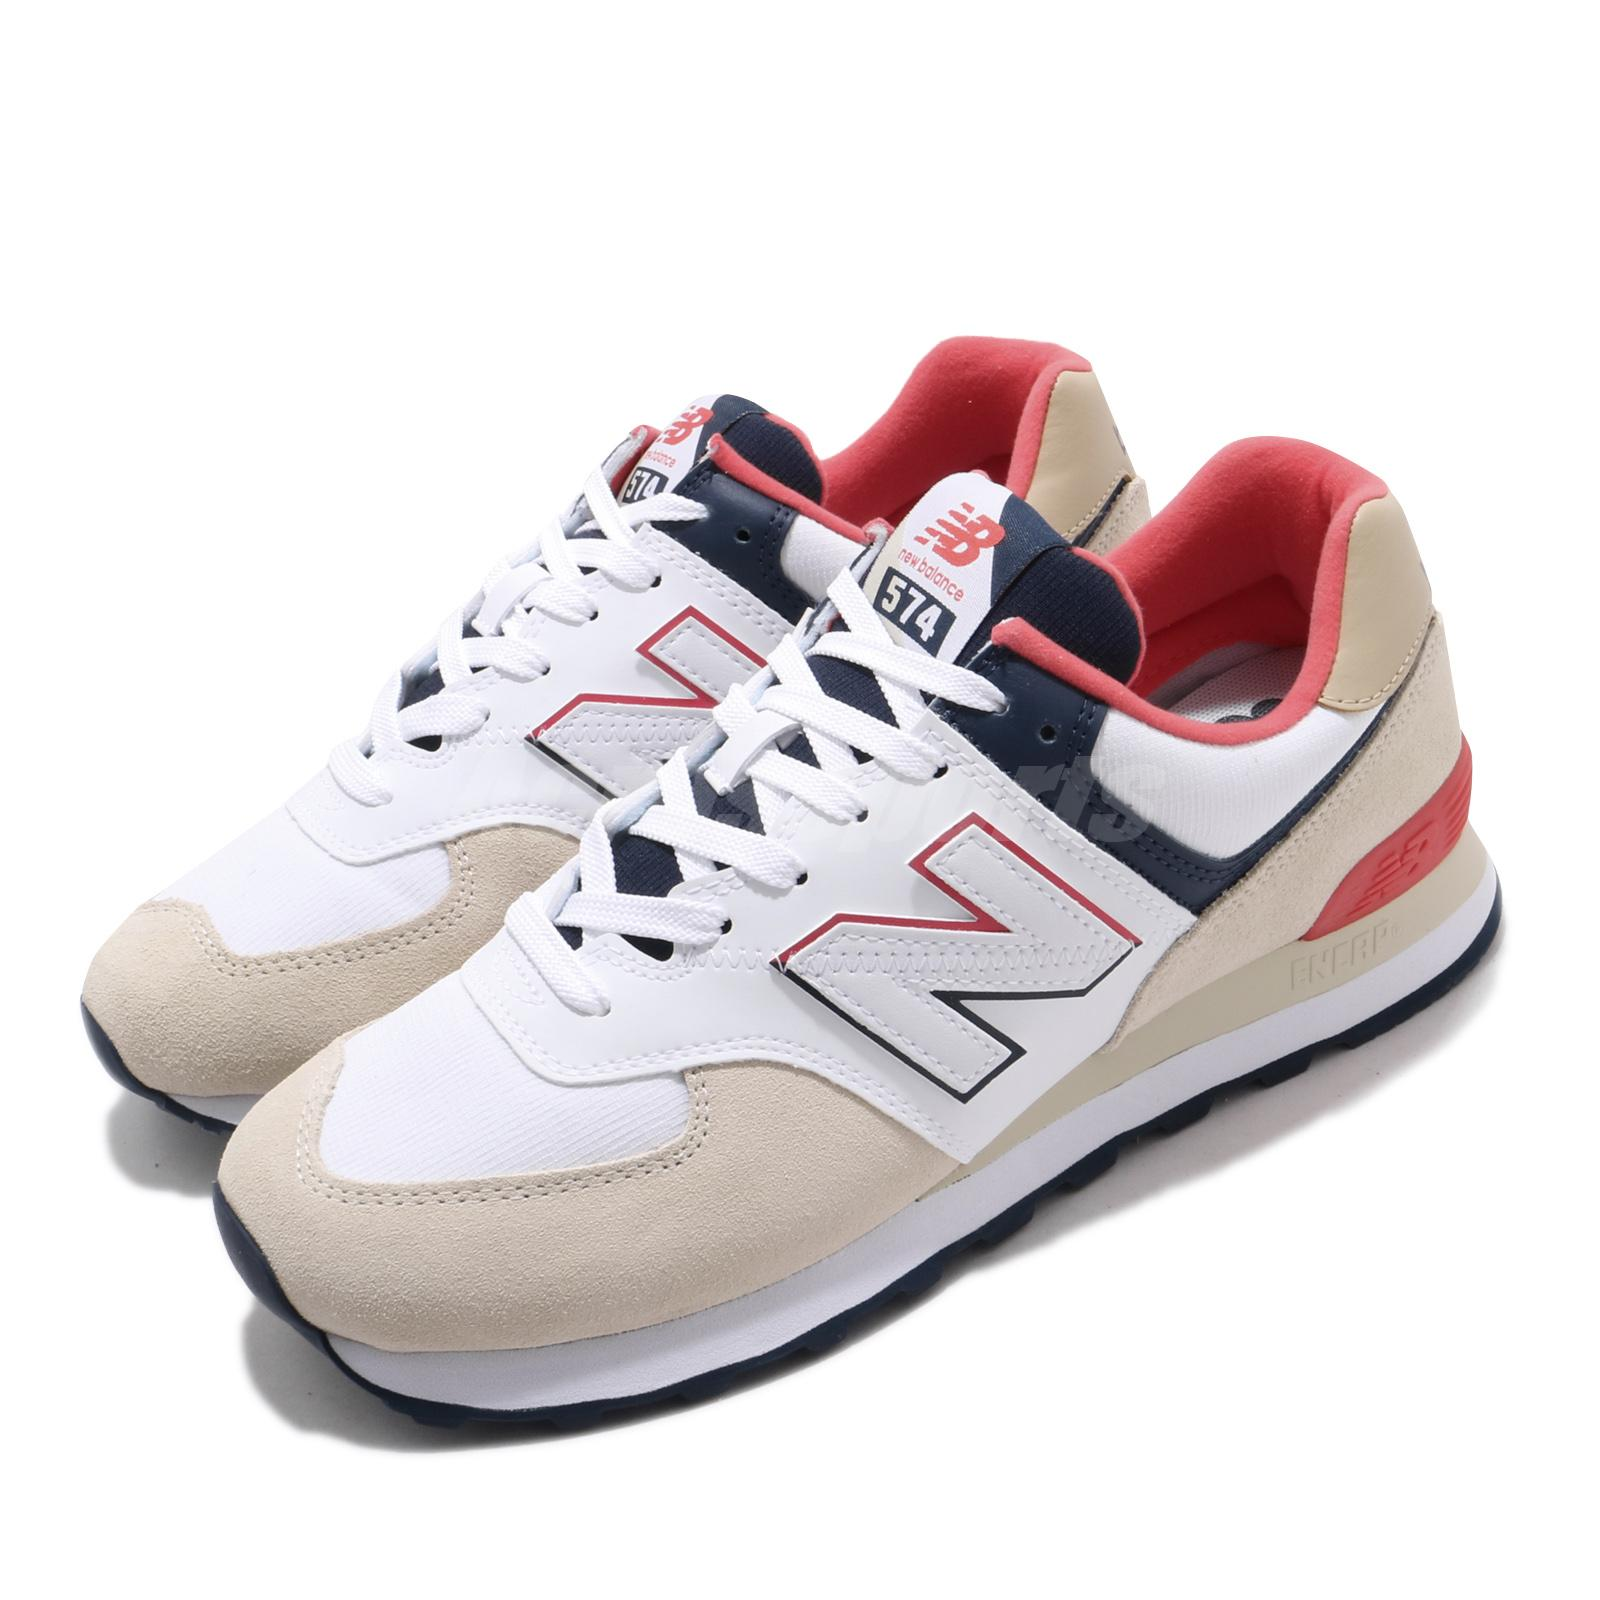 New Balance 574 White Khaki Navy Red